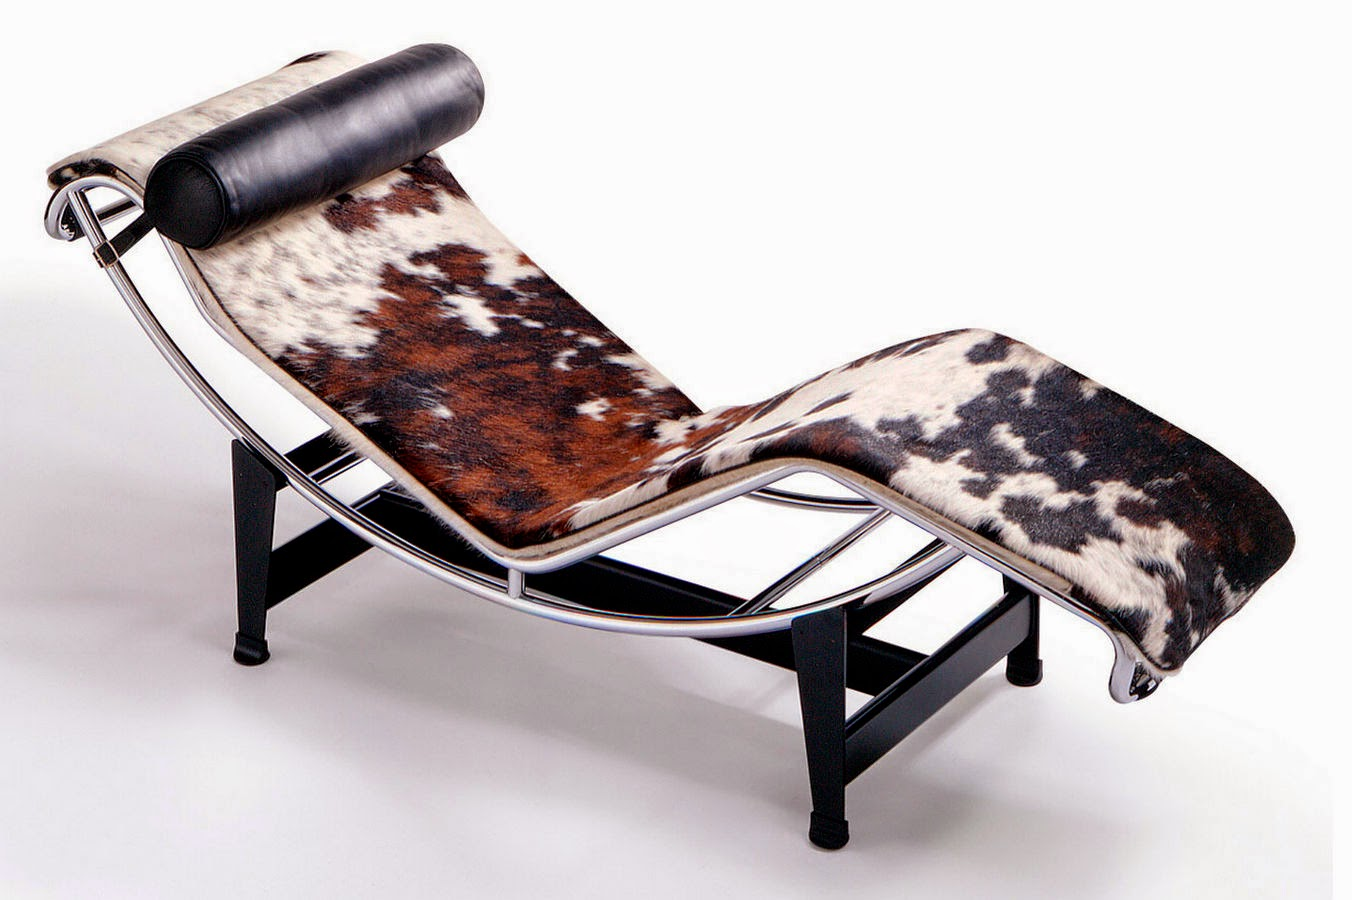 Designer retrospective - Le Corbusier | Be Inspired!